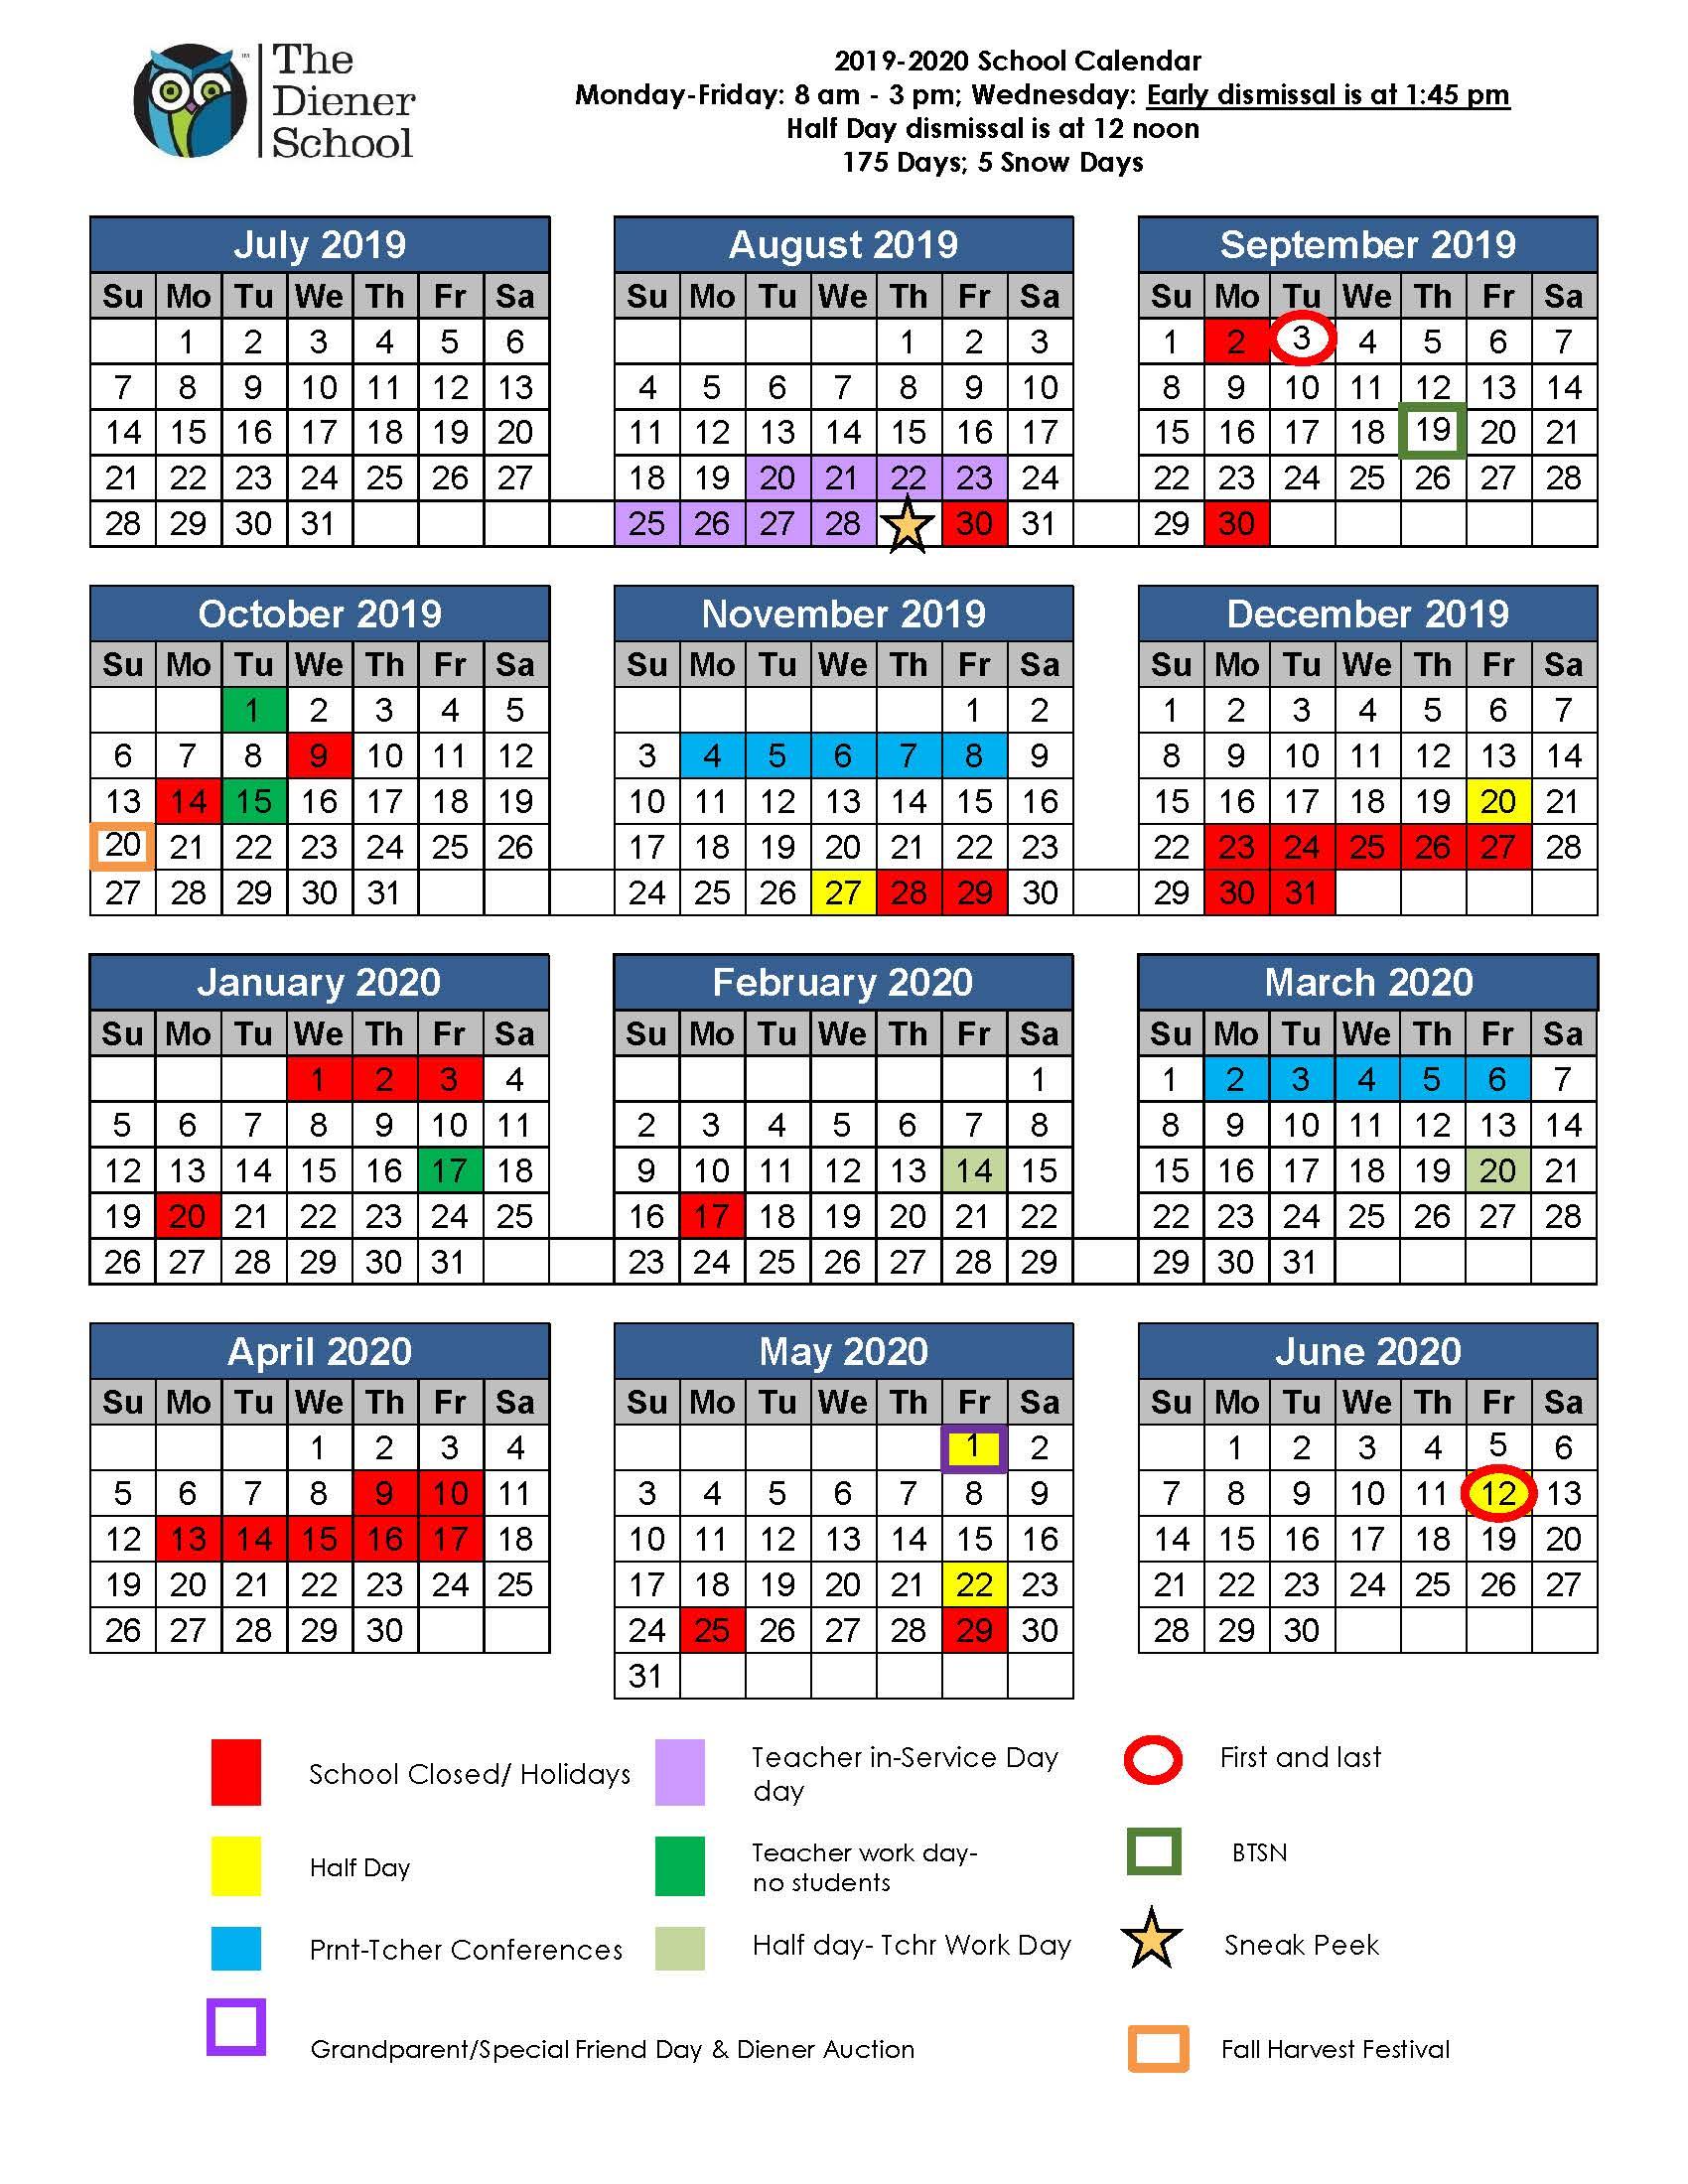 The Diener School Calendar 2019-2020